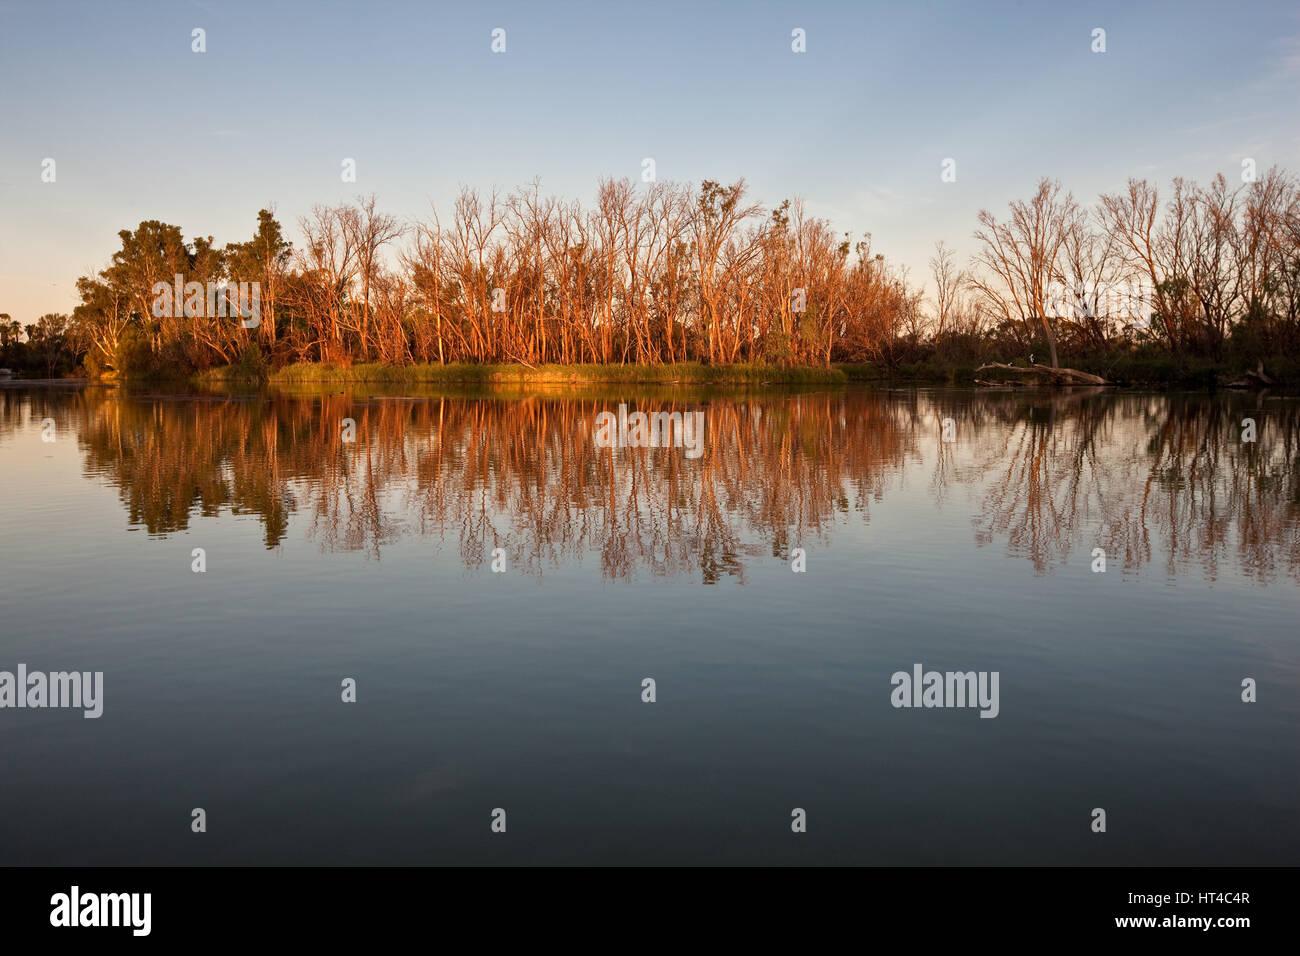 Late afternoon on the Murray River, near Mildura, Australia. - Stock Image